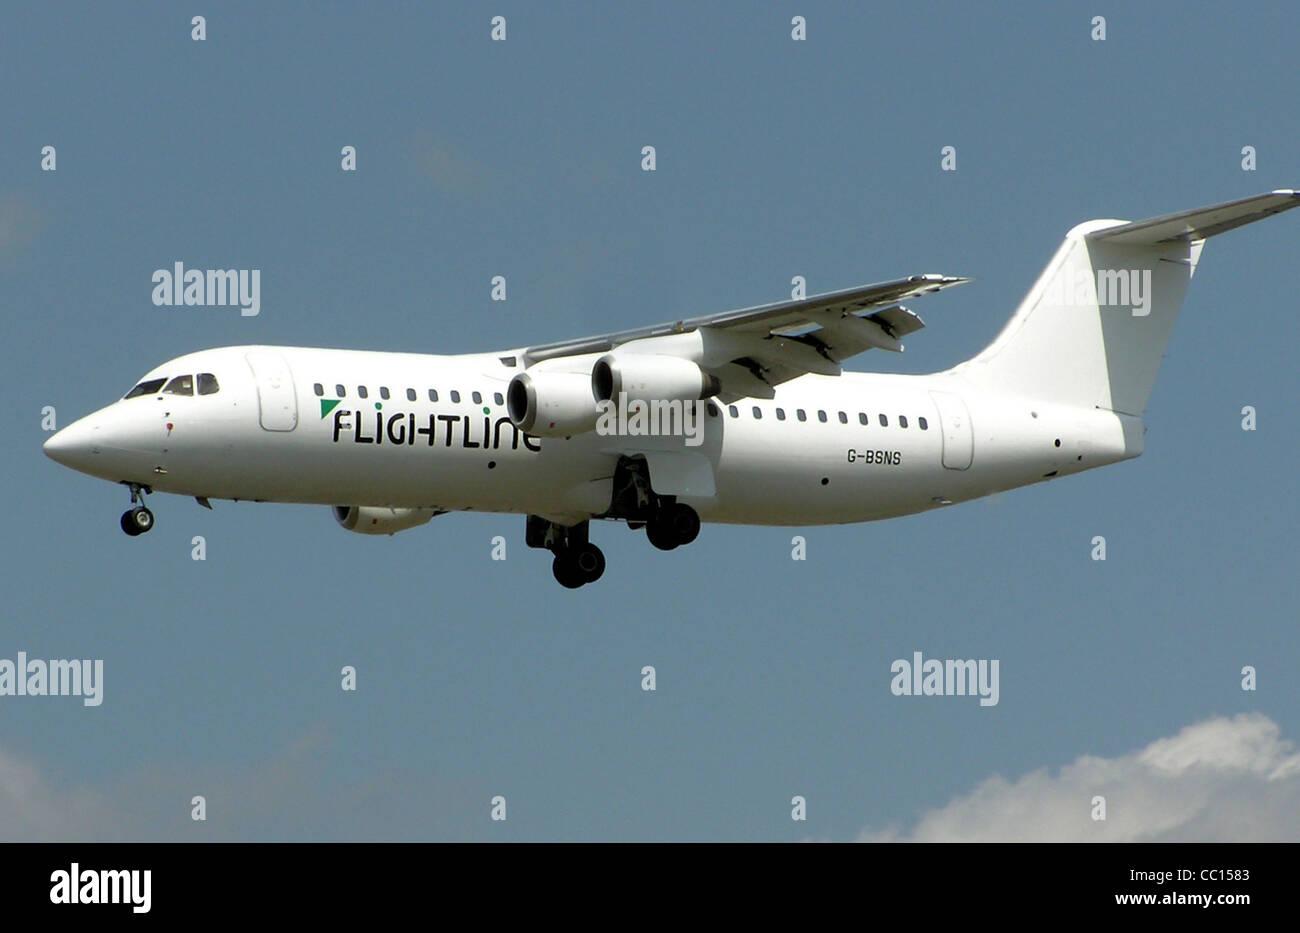 Flightline British Aerospace 146-300 (G-BSNS) landing at London Heathrow Airport. - Stock Image